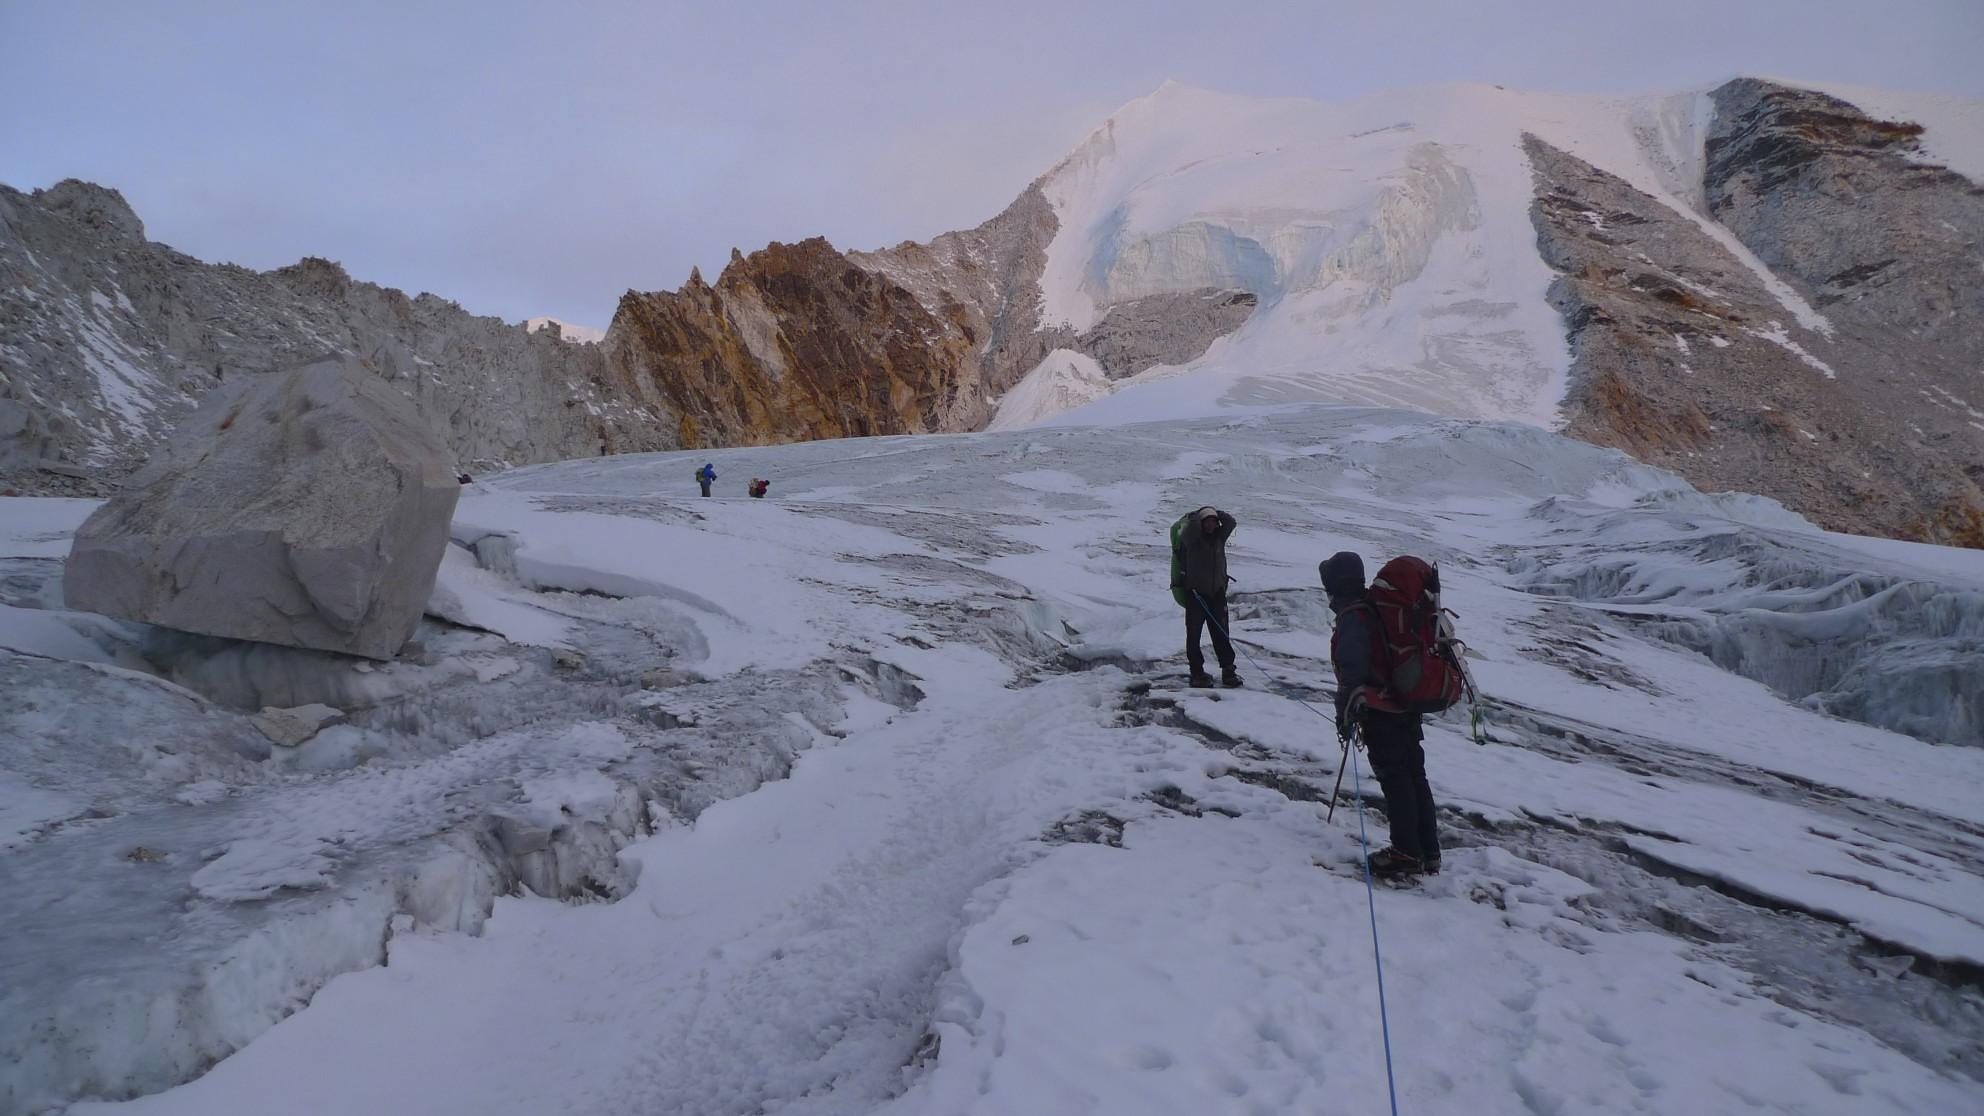 Sherpani Col ahead. At 6,000m